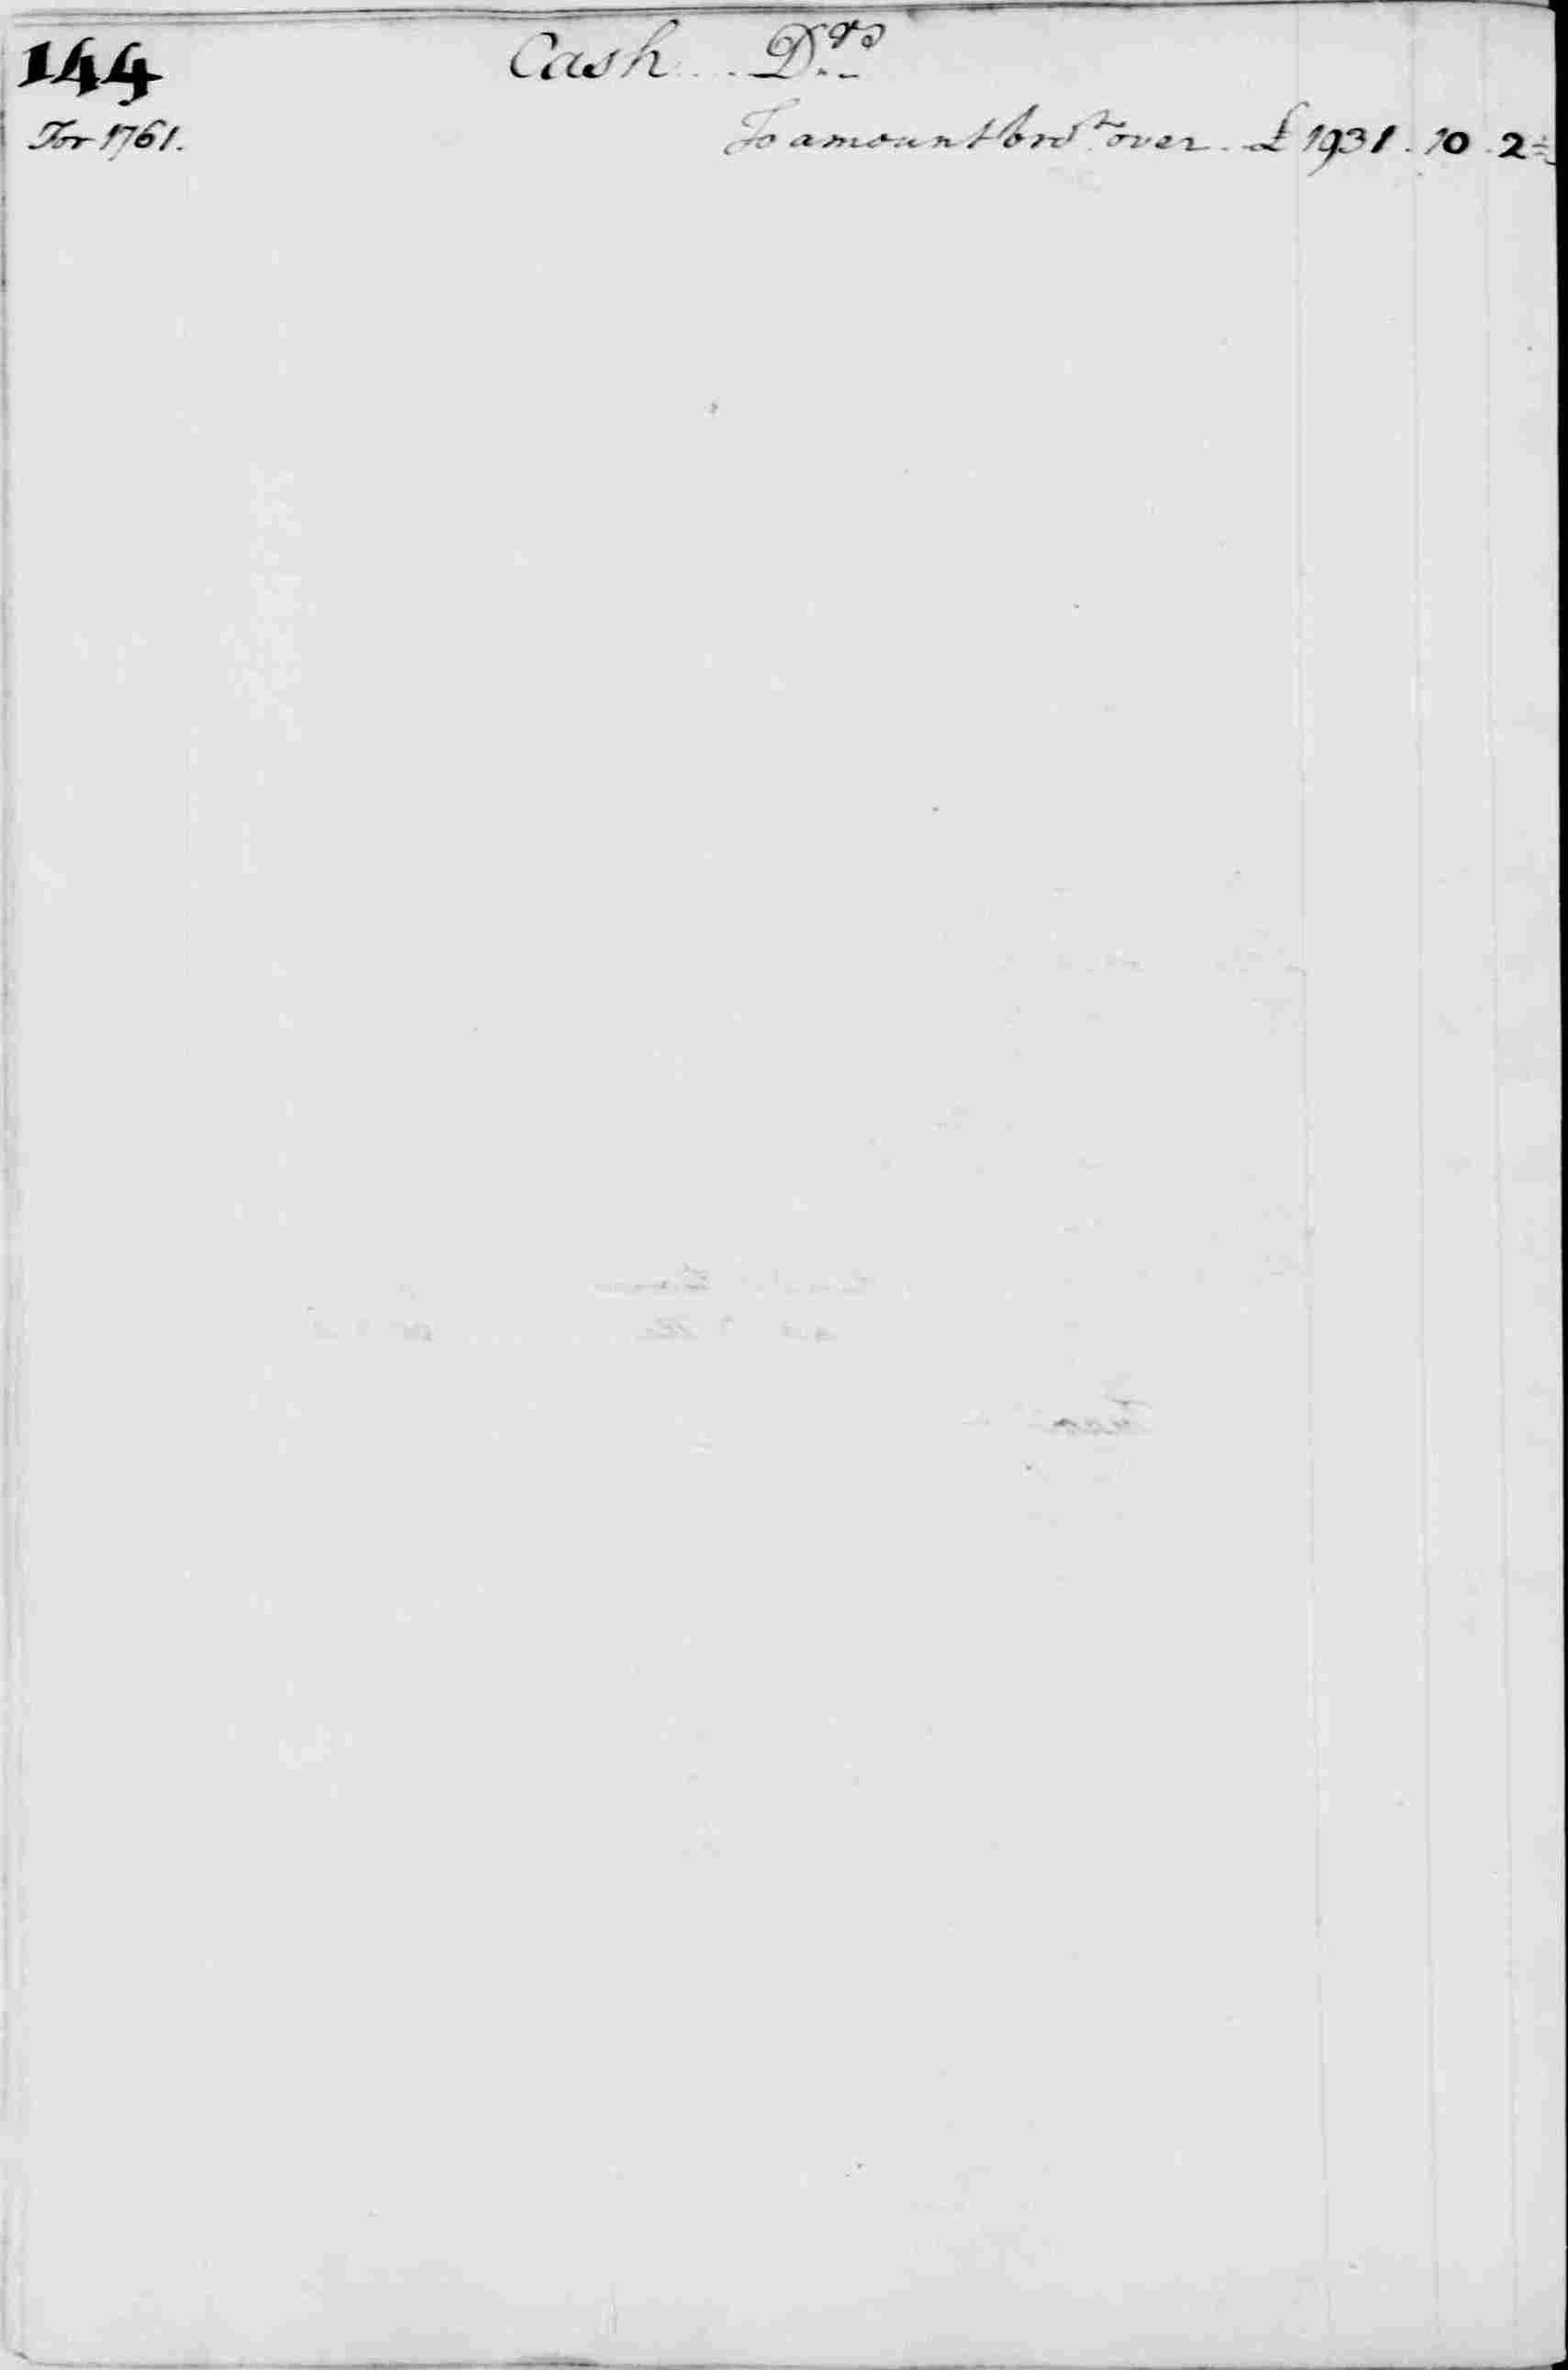 Ledger A, folio 144, left side